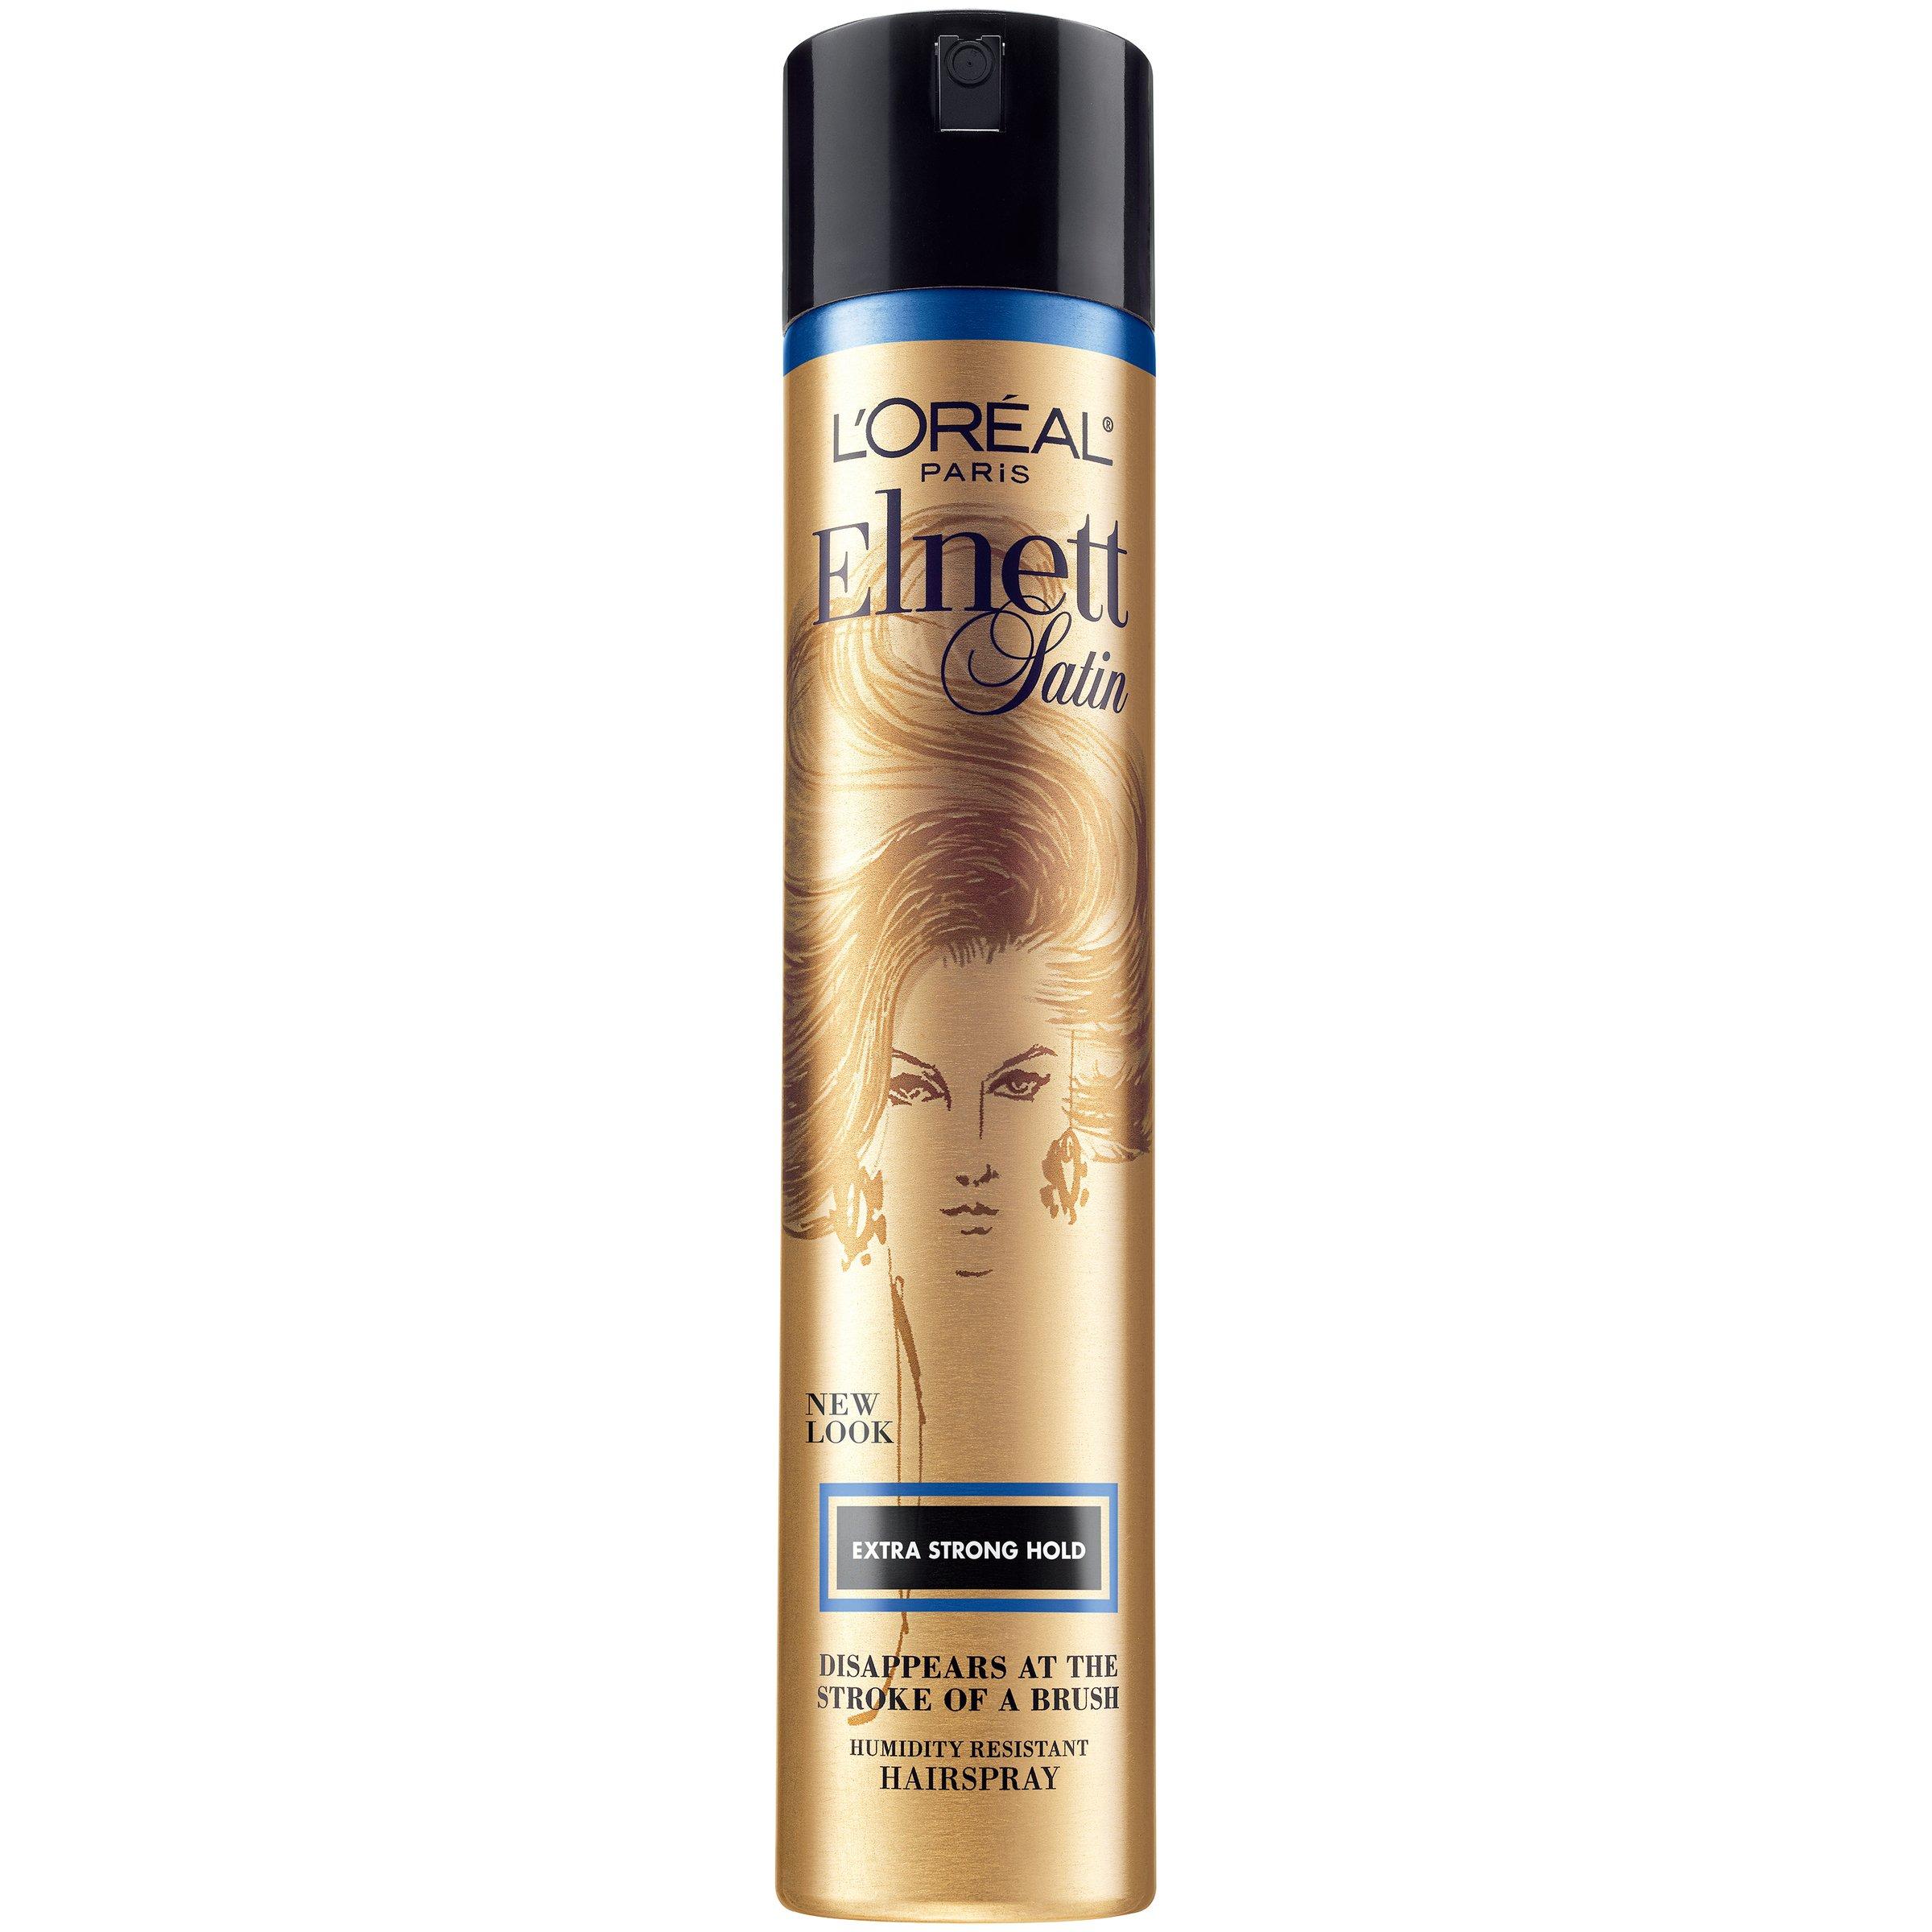 L'Oréal Paris Elnett Satin Extra Strong Hold Hairspray, 11 oz. (Packaging May Vary)